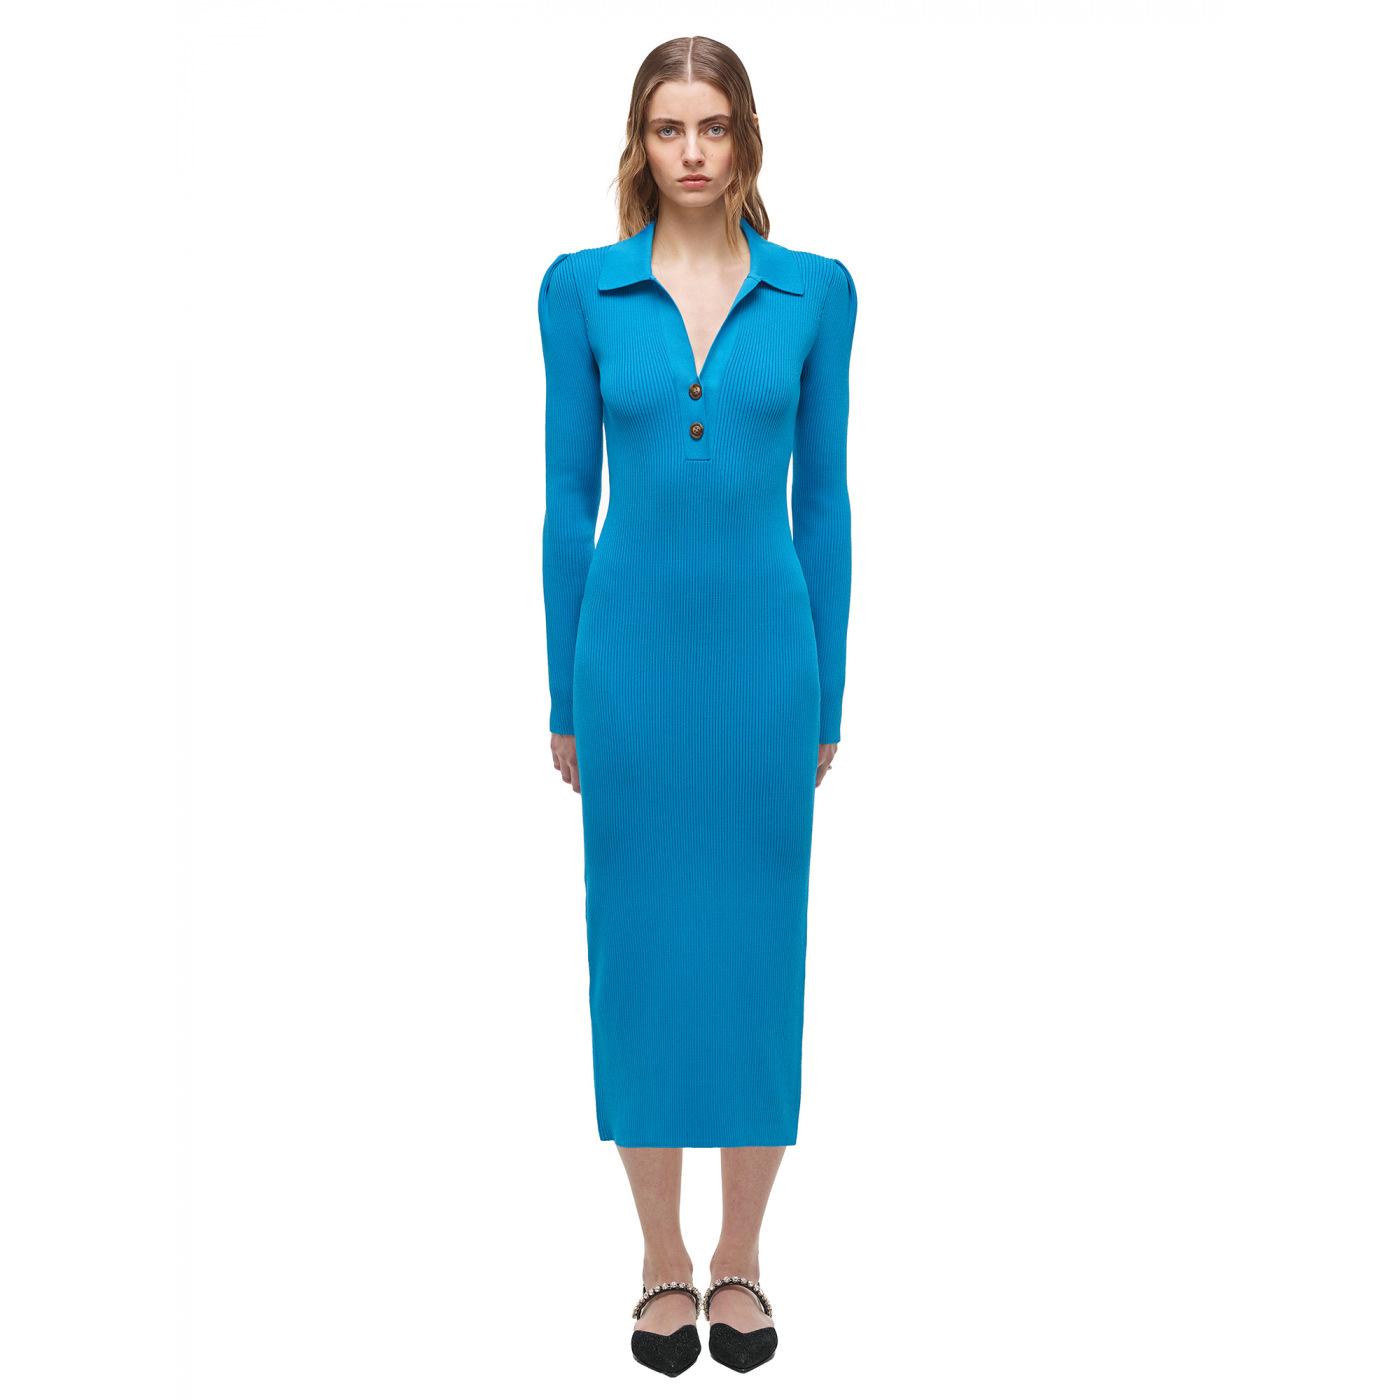 Vivid Blue Ribbed Knit Midi Dress by Self portrait, available on self-portrait-studio.com for $455 Emily Ratajkowski Dress Exact Product